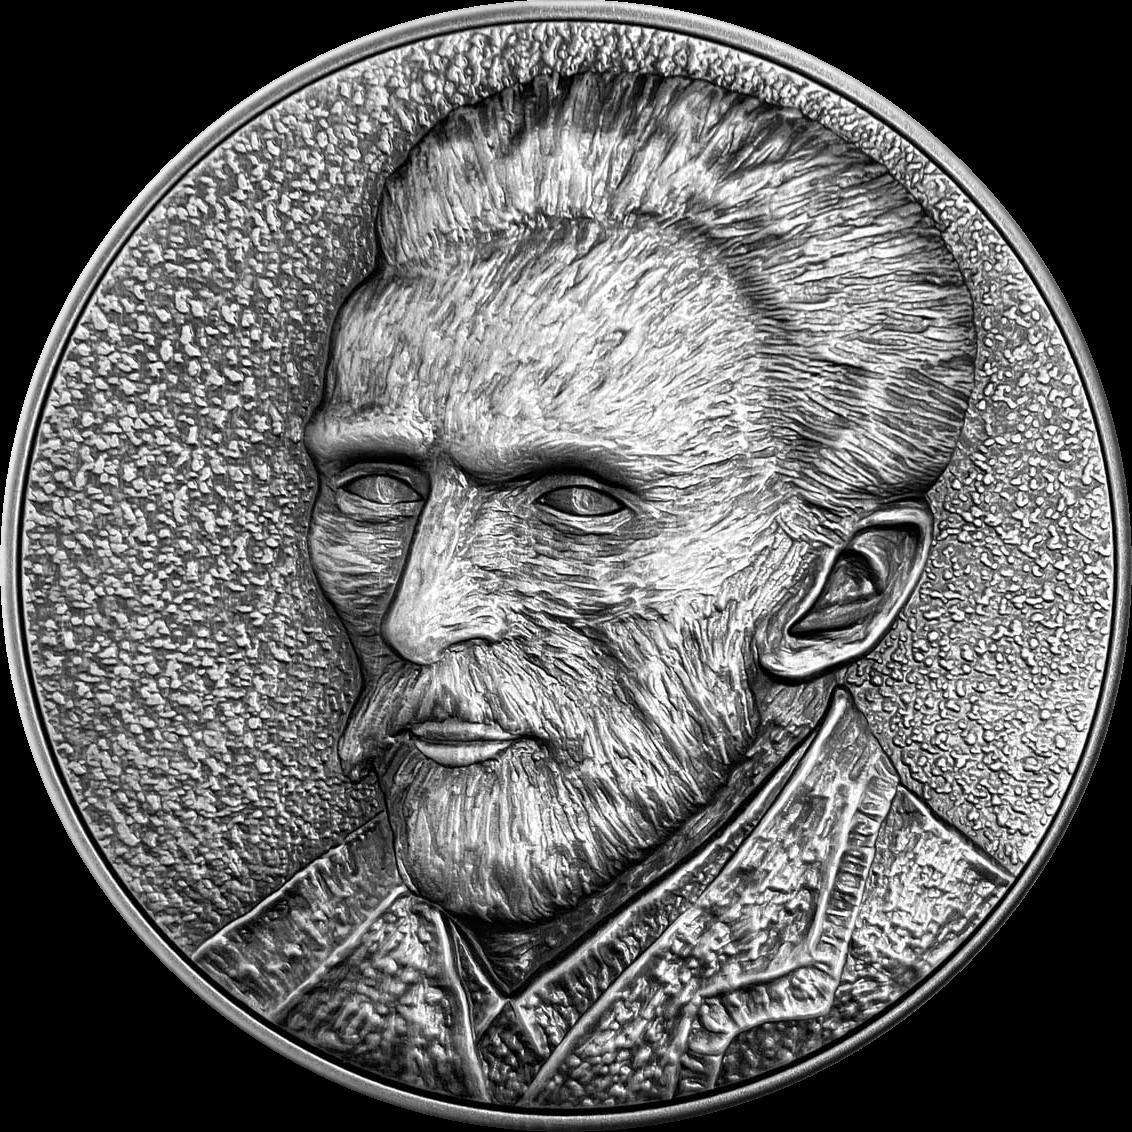 Ниуэ монета 5 долларов Винсент ван Гог, реверс